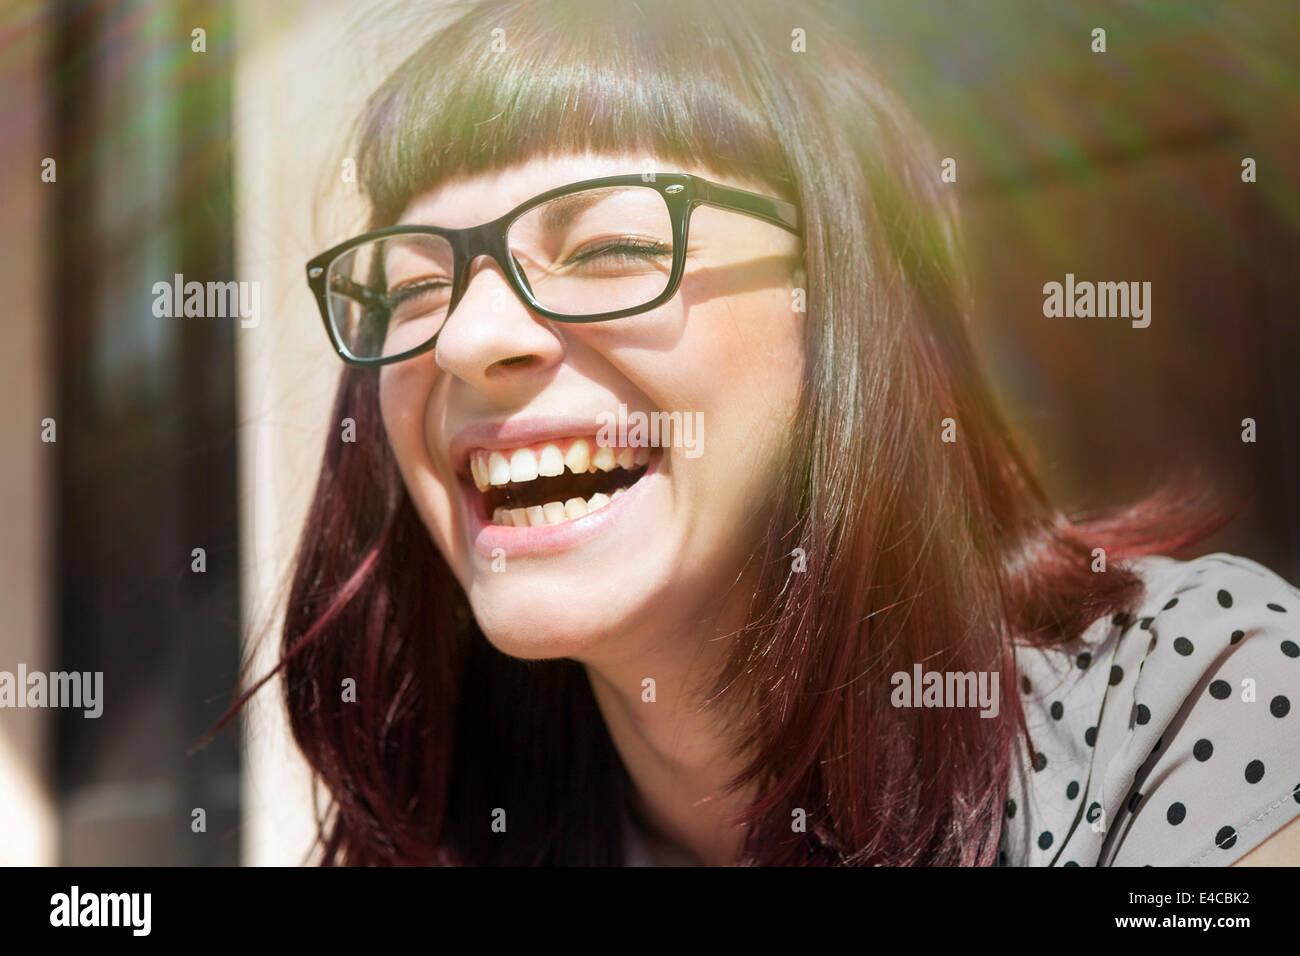 Jeune femme en riant avec joie, Osijek, Croatie Photo Stock